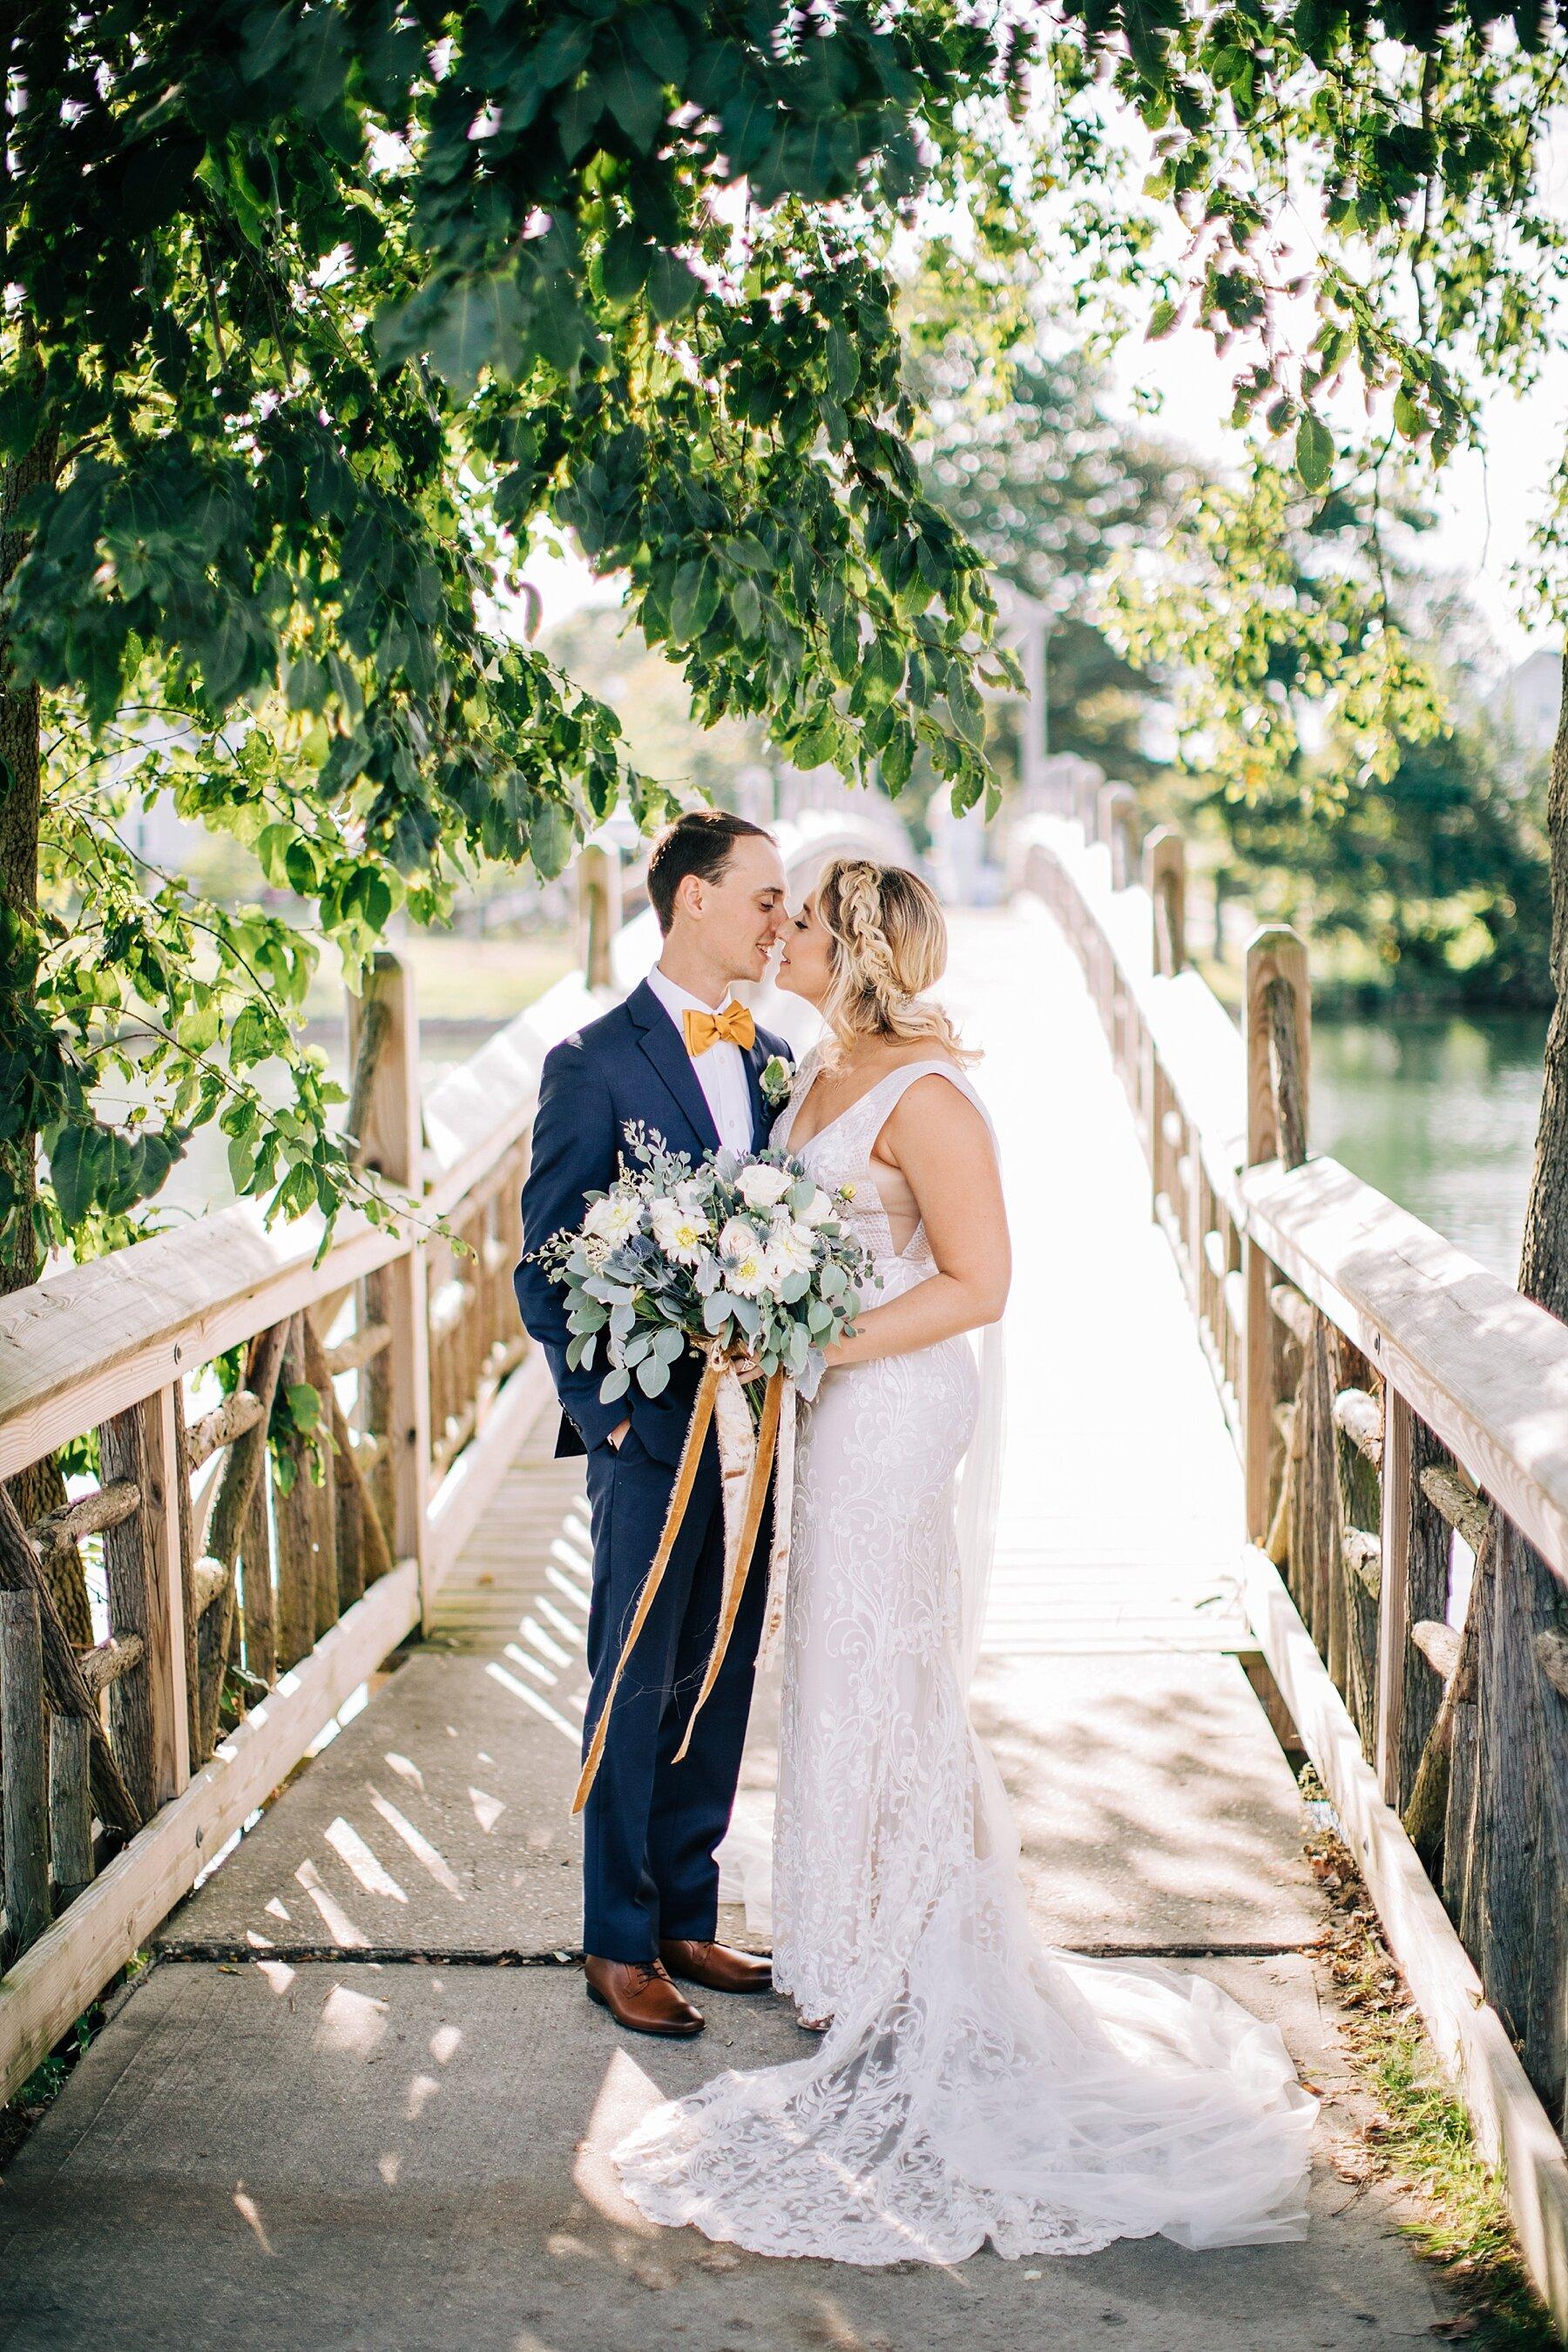 the-mill-lakeside-manor-spring-lake-wedding-photographer_0033.jpg